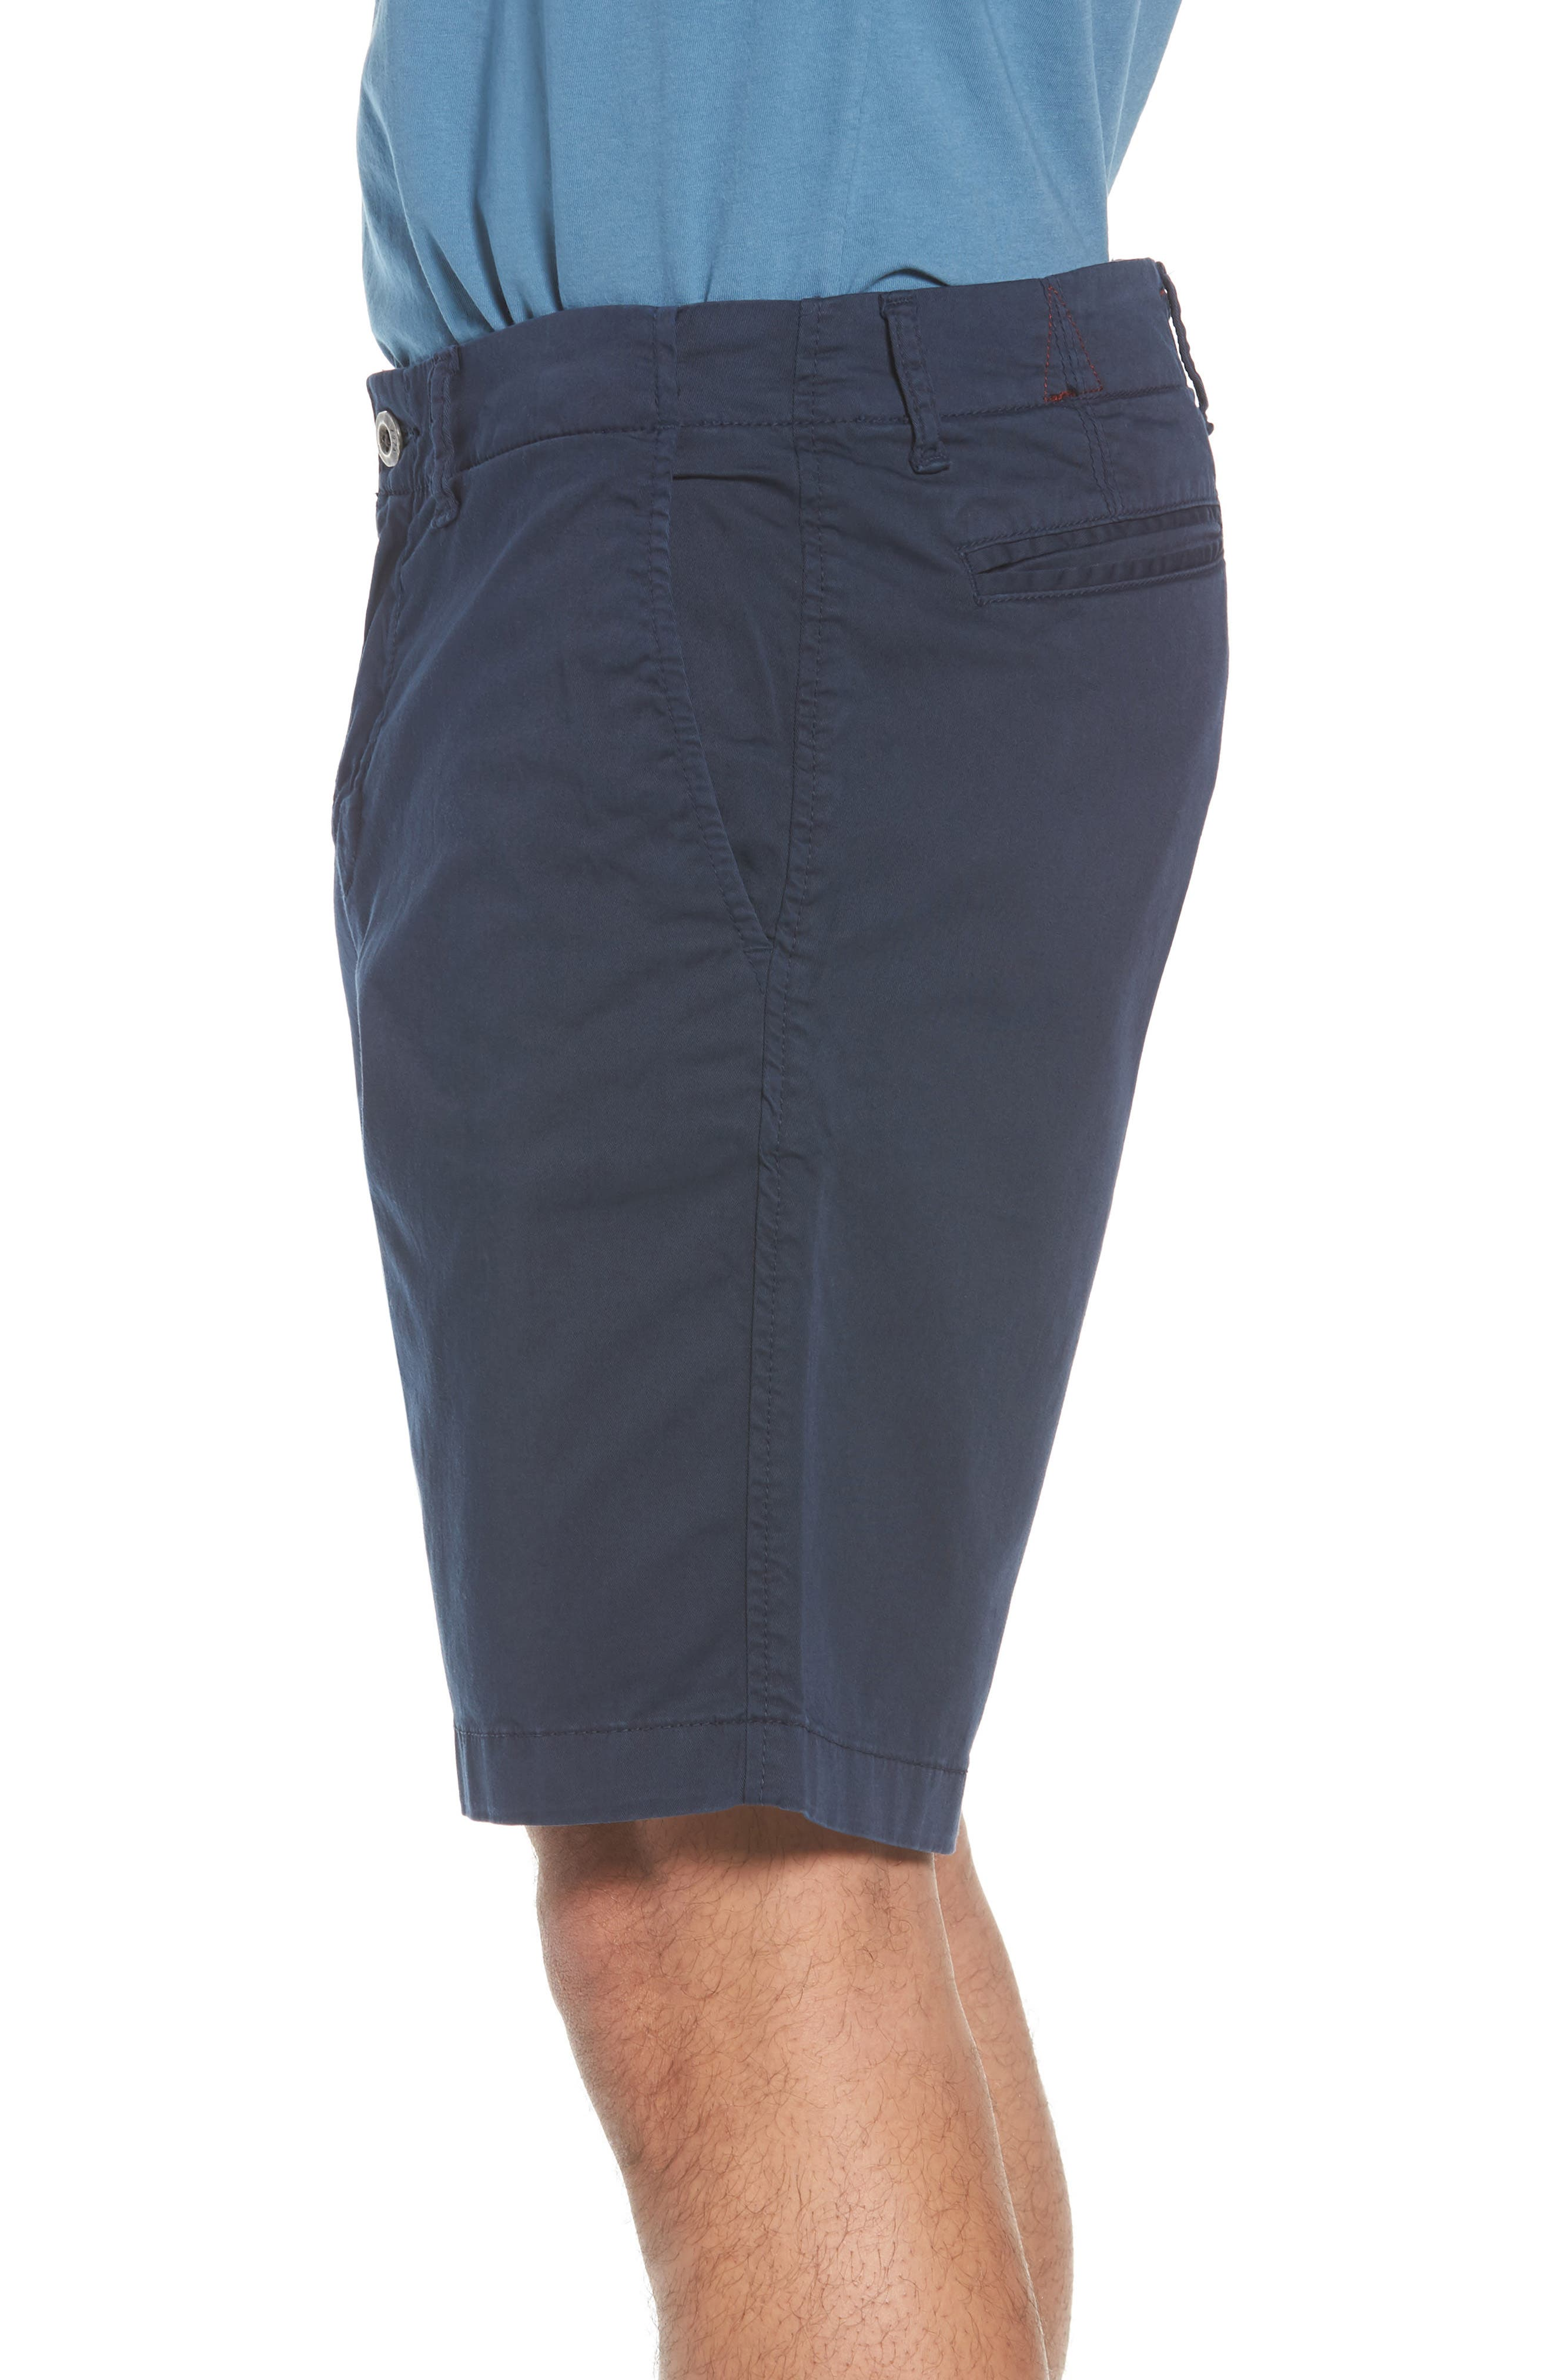 St. Barts Twill Shorts,                             Alternate thumbnail 33, color,